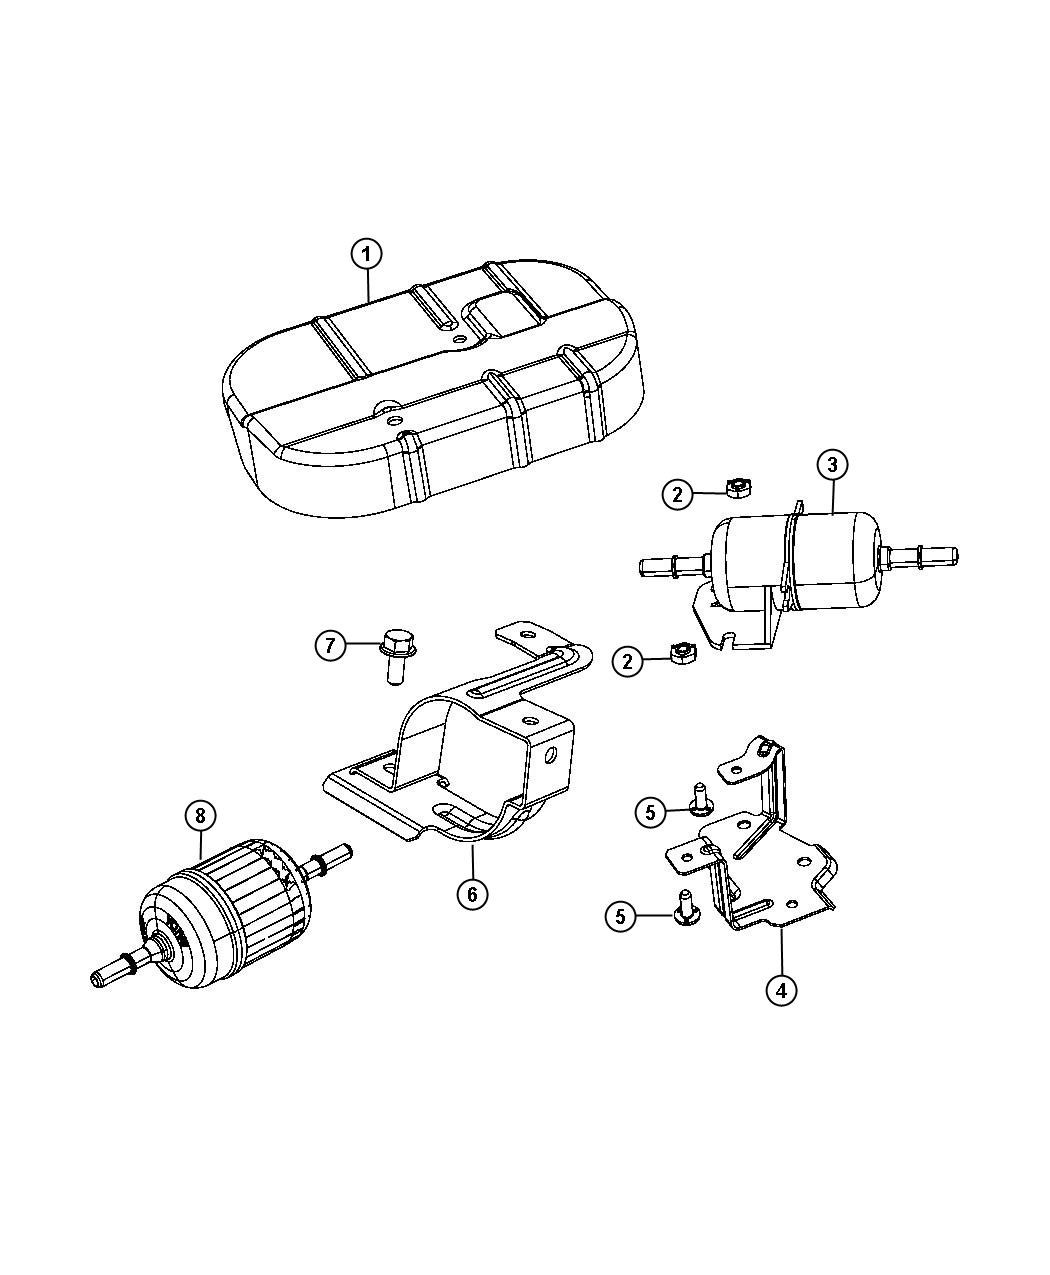 Fiat 500e Filter Fuel Maintenance